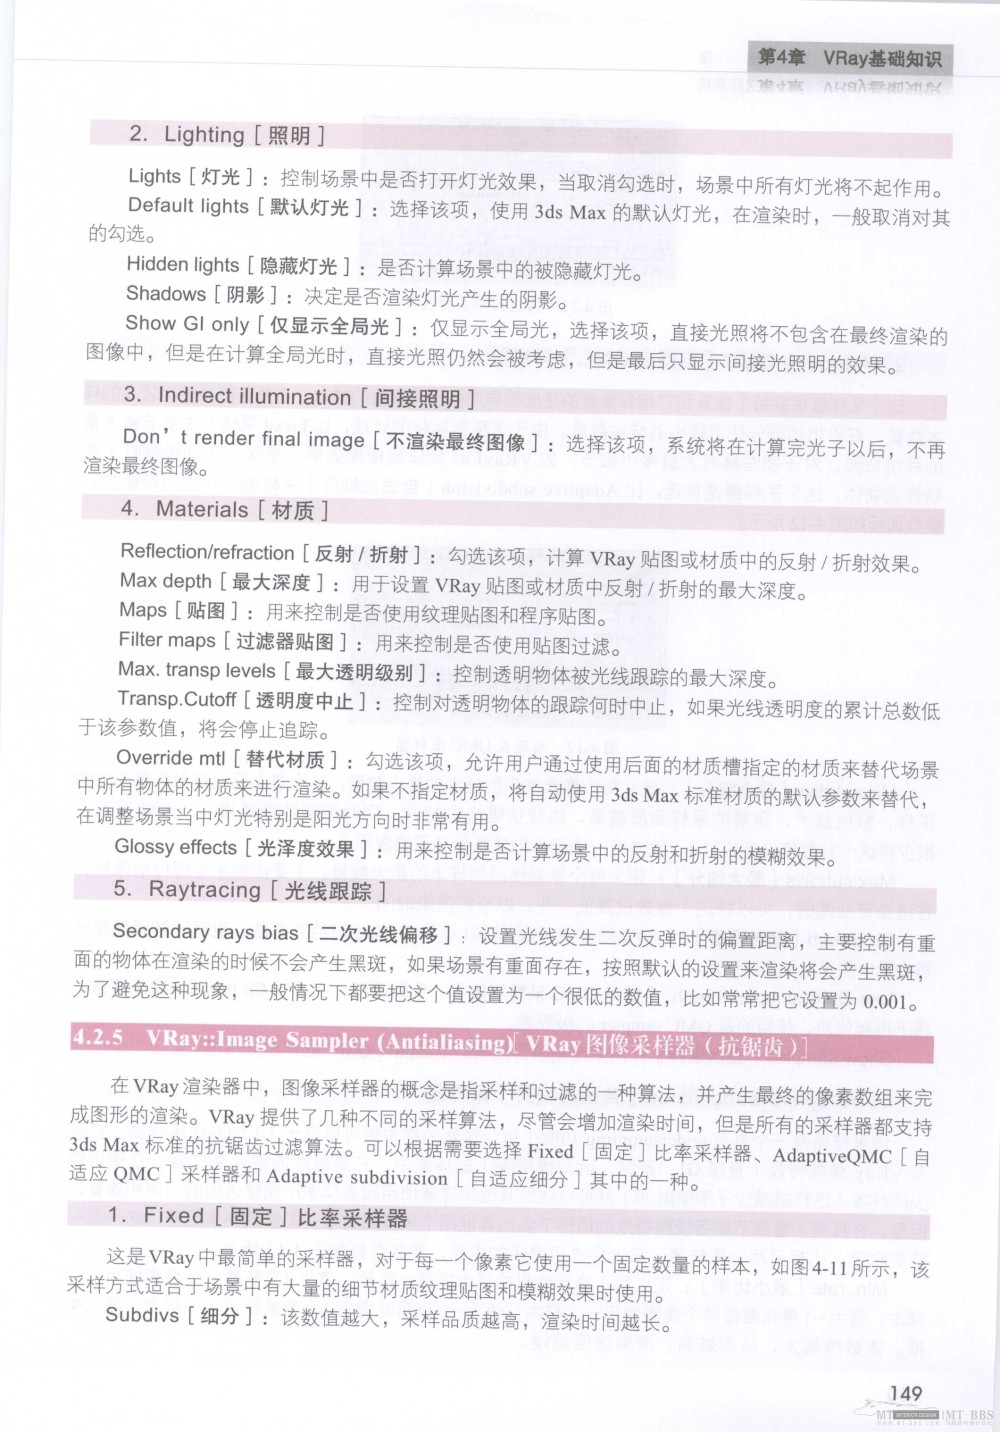 水晶石技法-3ds_Max&VRay室内空间表现_水晶石技法-3ds_Max&VRay室内空间表现_页面_155.jpg